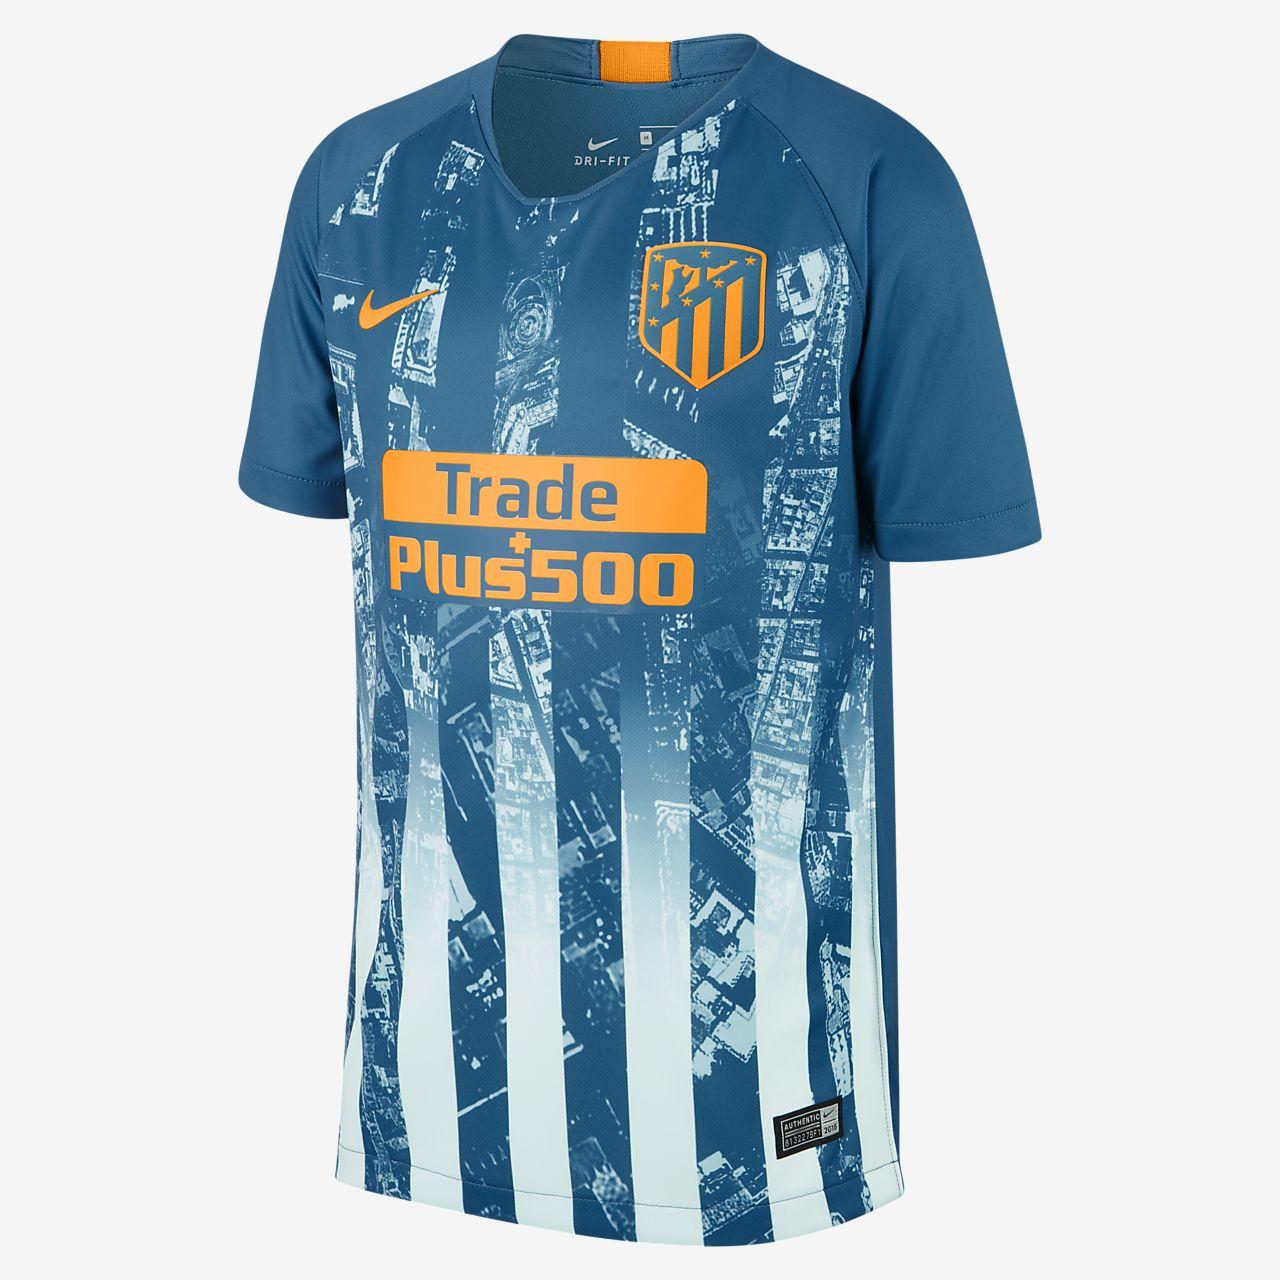 Camiseta de fútbol para niños talla grande alternativa Stadium del Atlético  de Madrid 2018 19 8ca8d2b0fbe